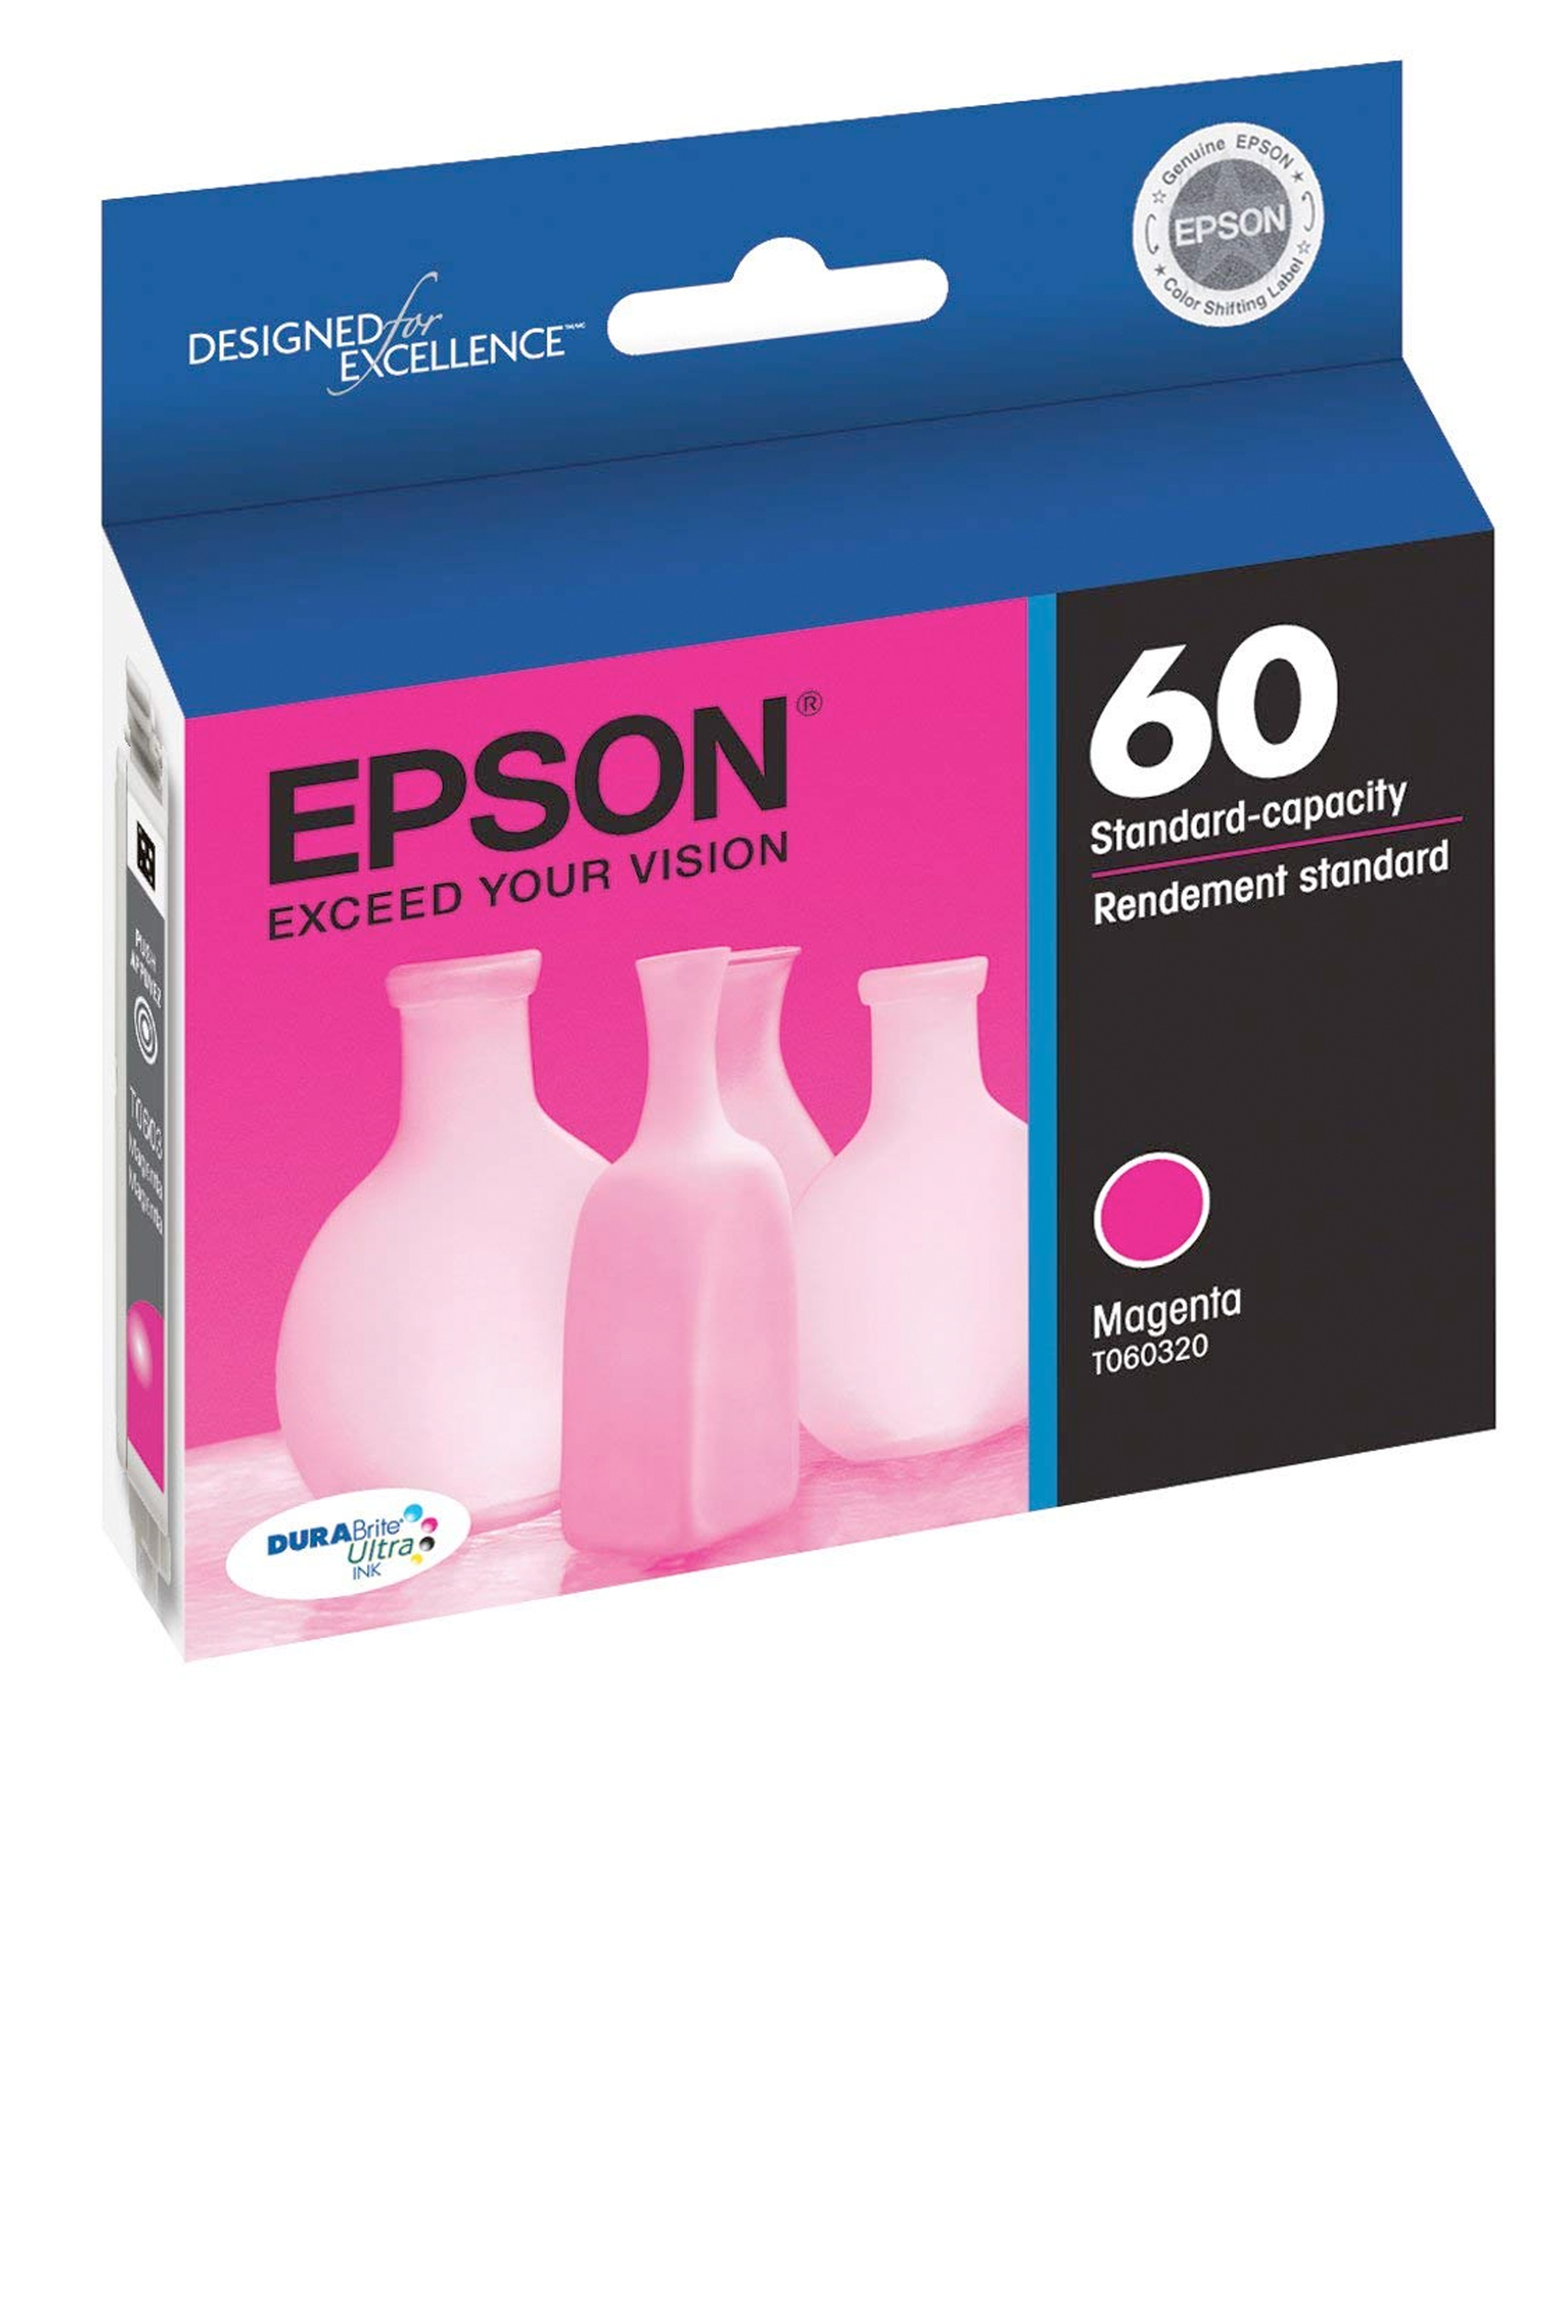 Epson 60, Magenta Ink CartridgE (T060320-S)